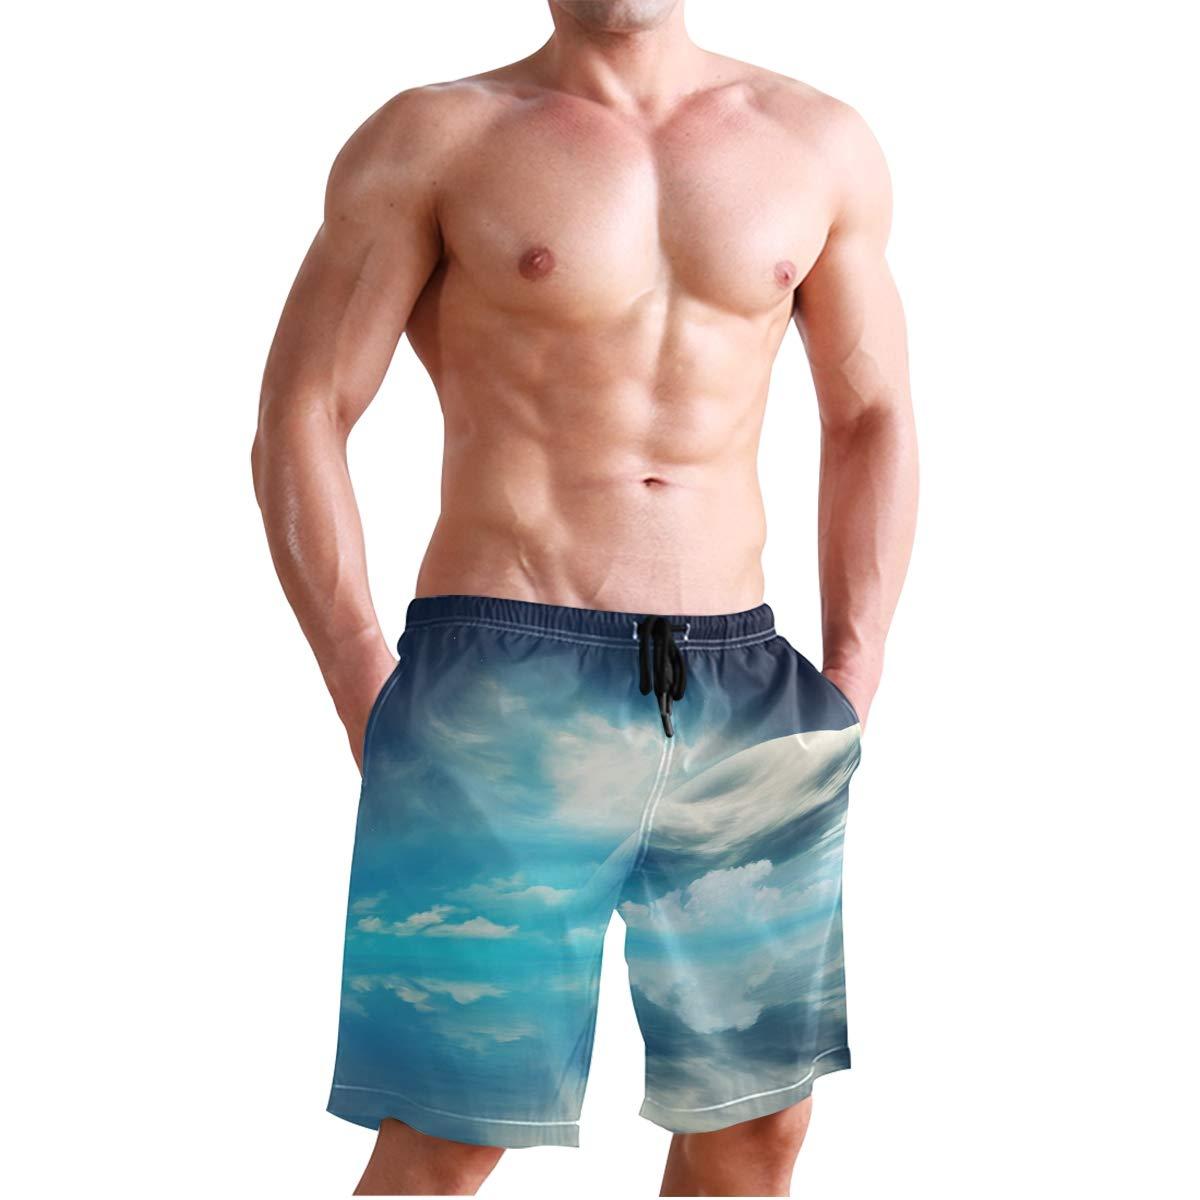 Men/'s Swim Trunks Beach Board Swimwear Shorts Earth Ocean Swimming Short Pants Quick Dry Water Shorts Mesh Lining